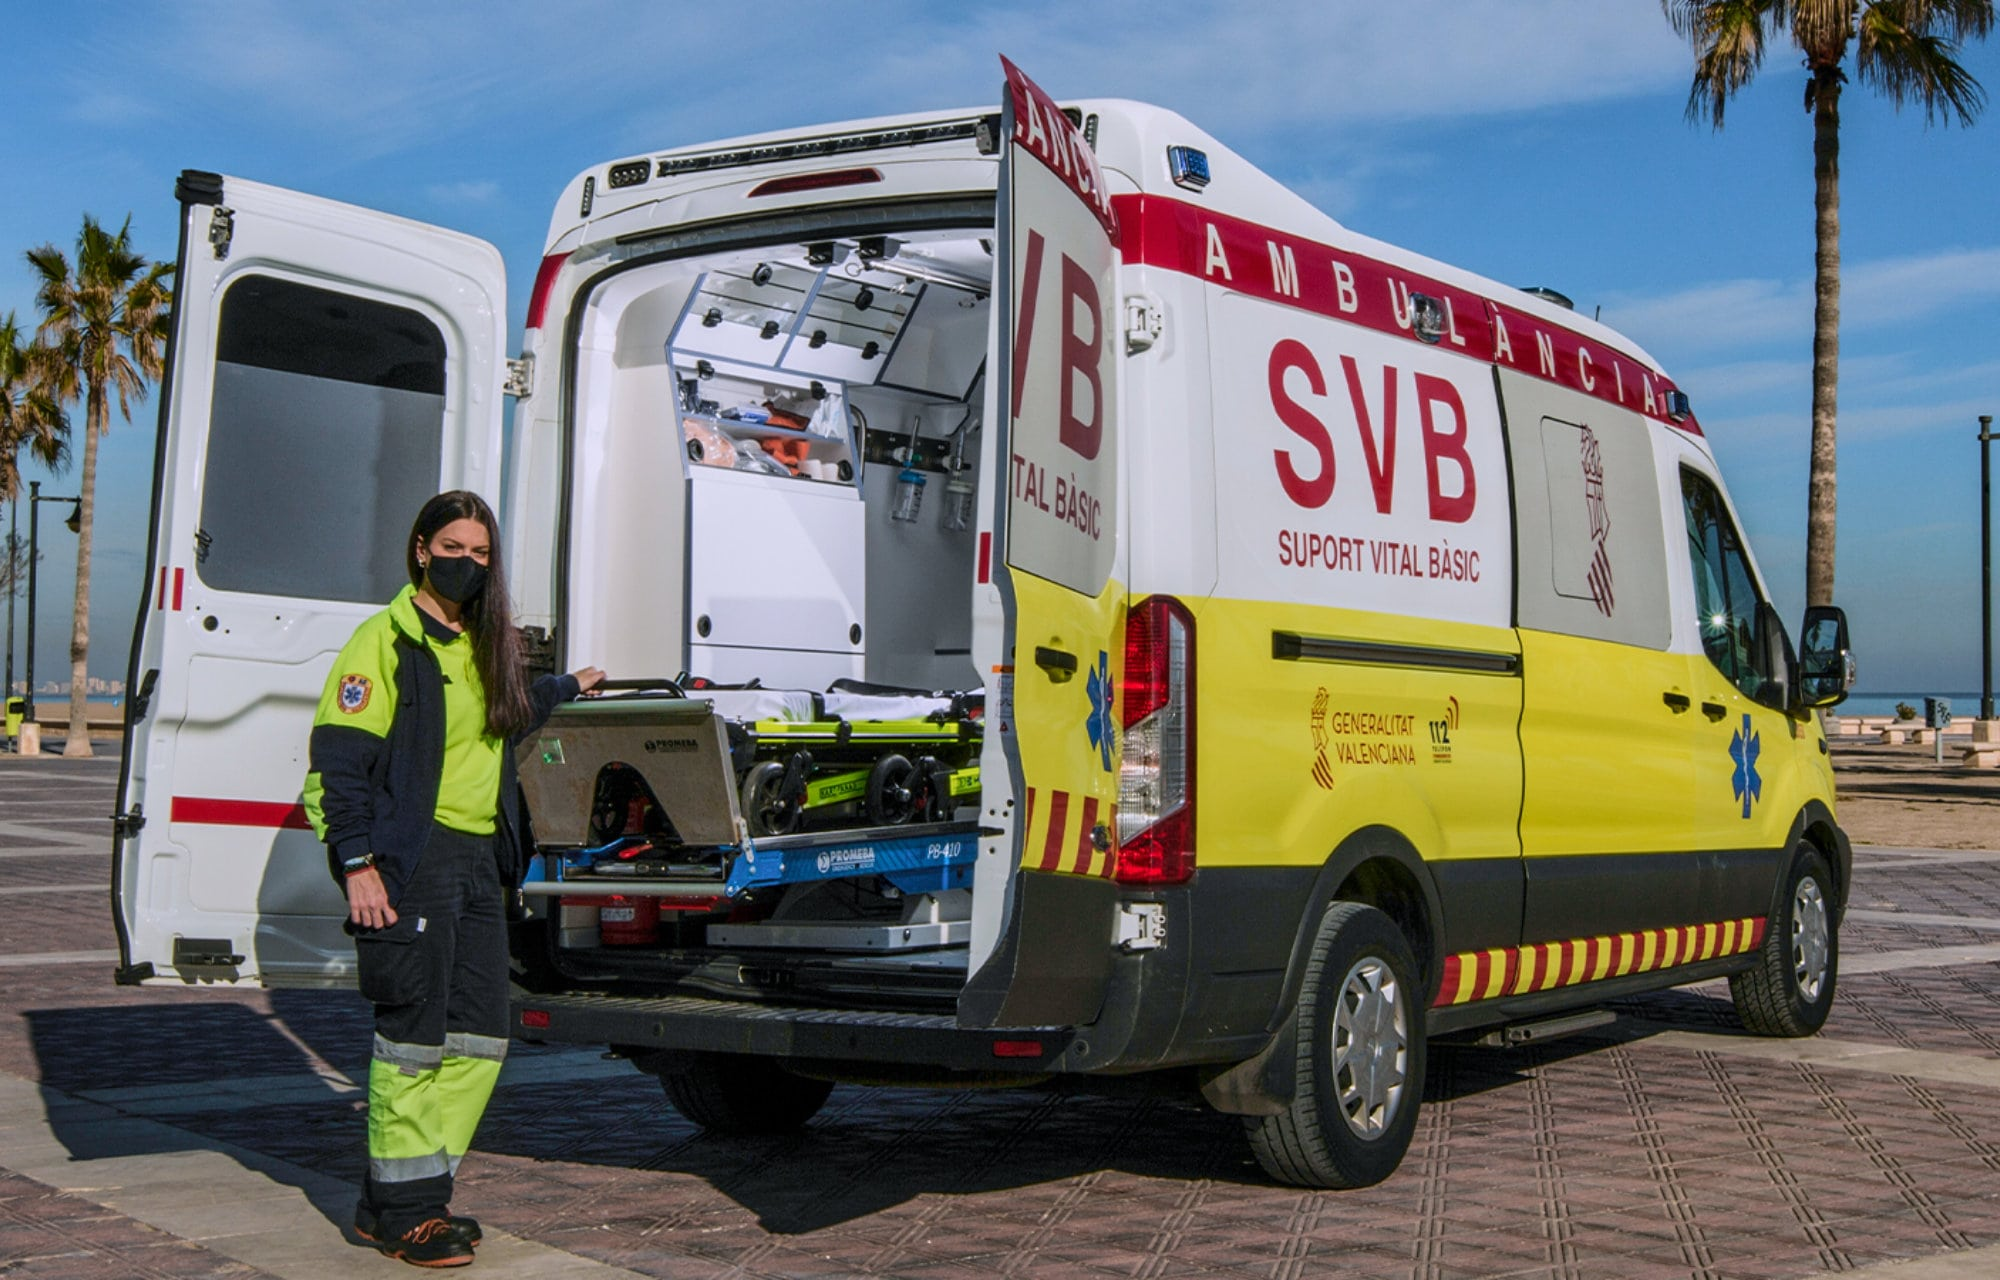 Ford Ambulance en Ambulance personeel in Valencia Spanje